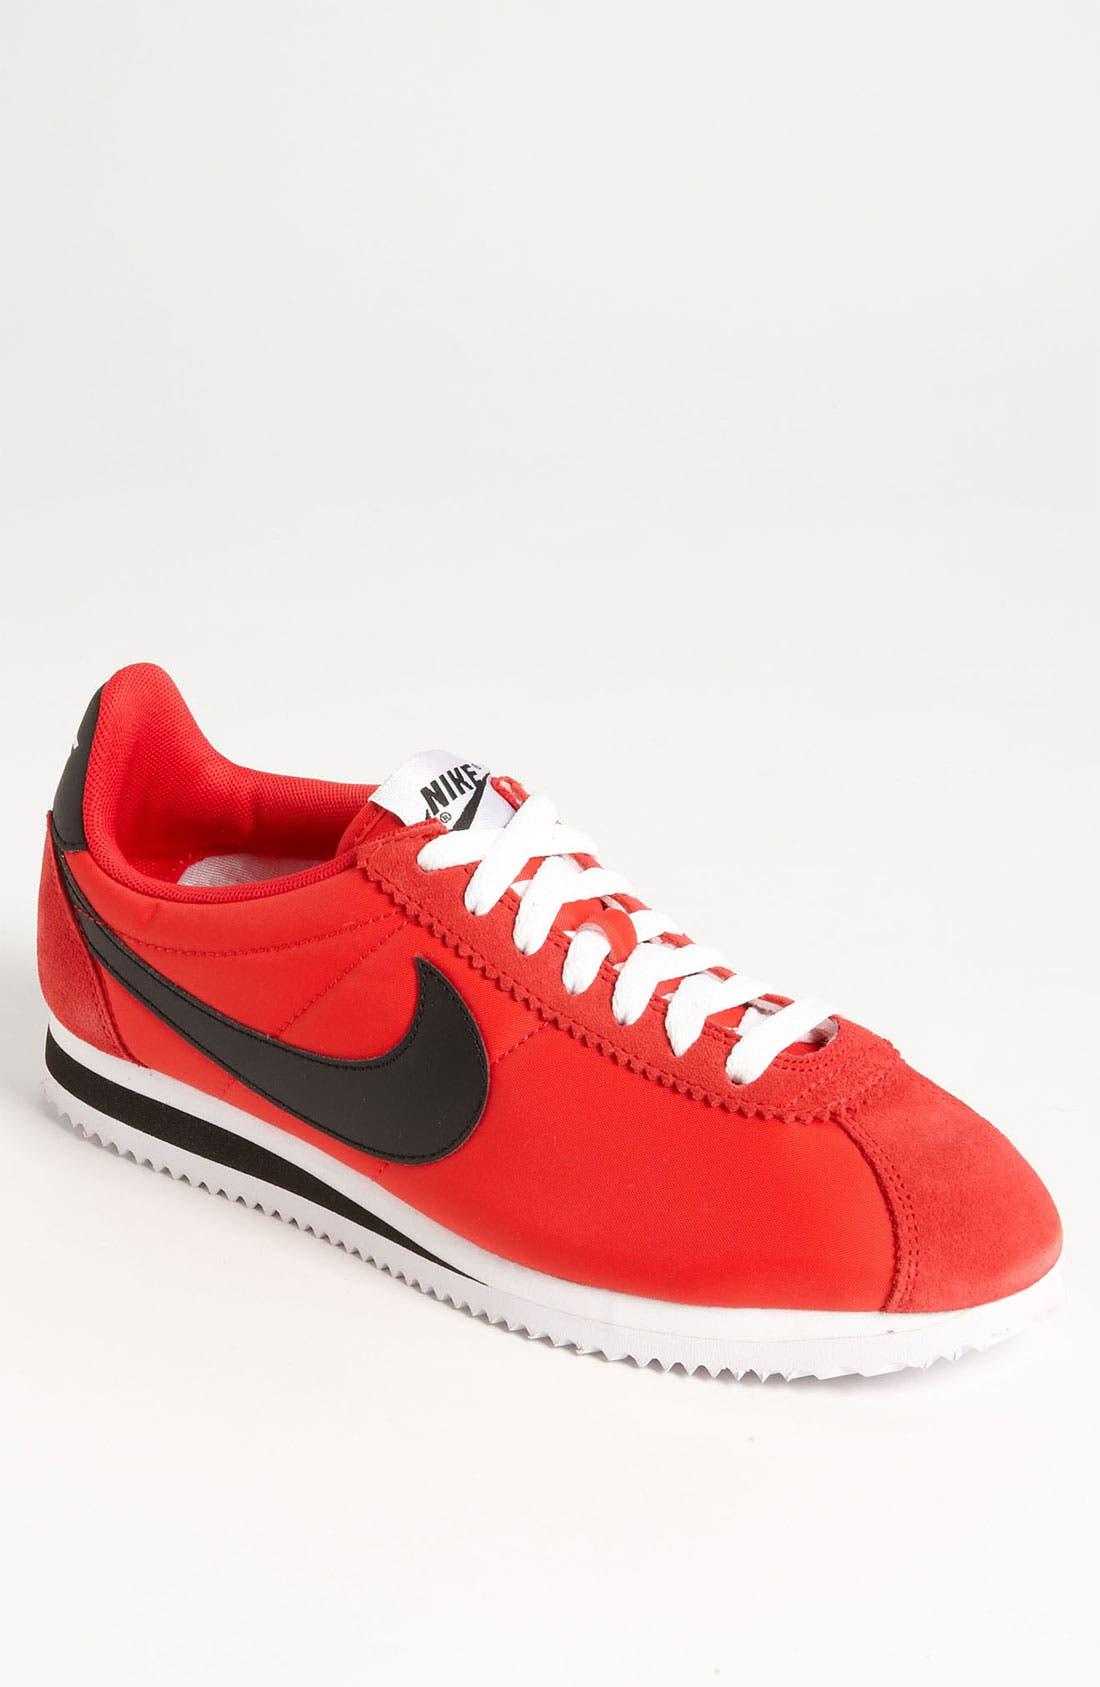 Alternate Image 1 Selected - Nike 'Classic Cortez' Sneaker (Men)